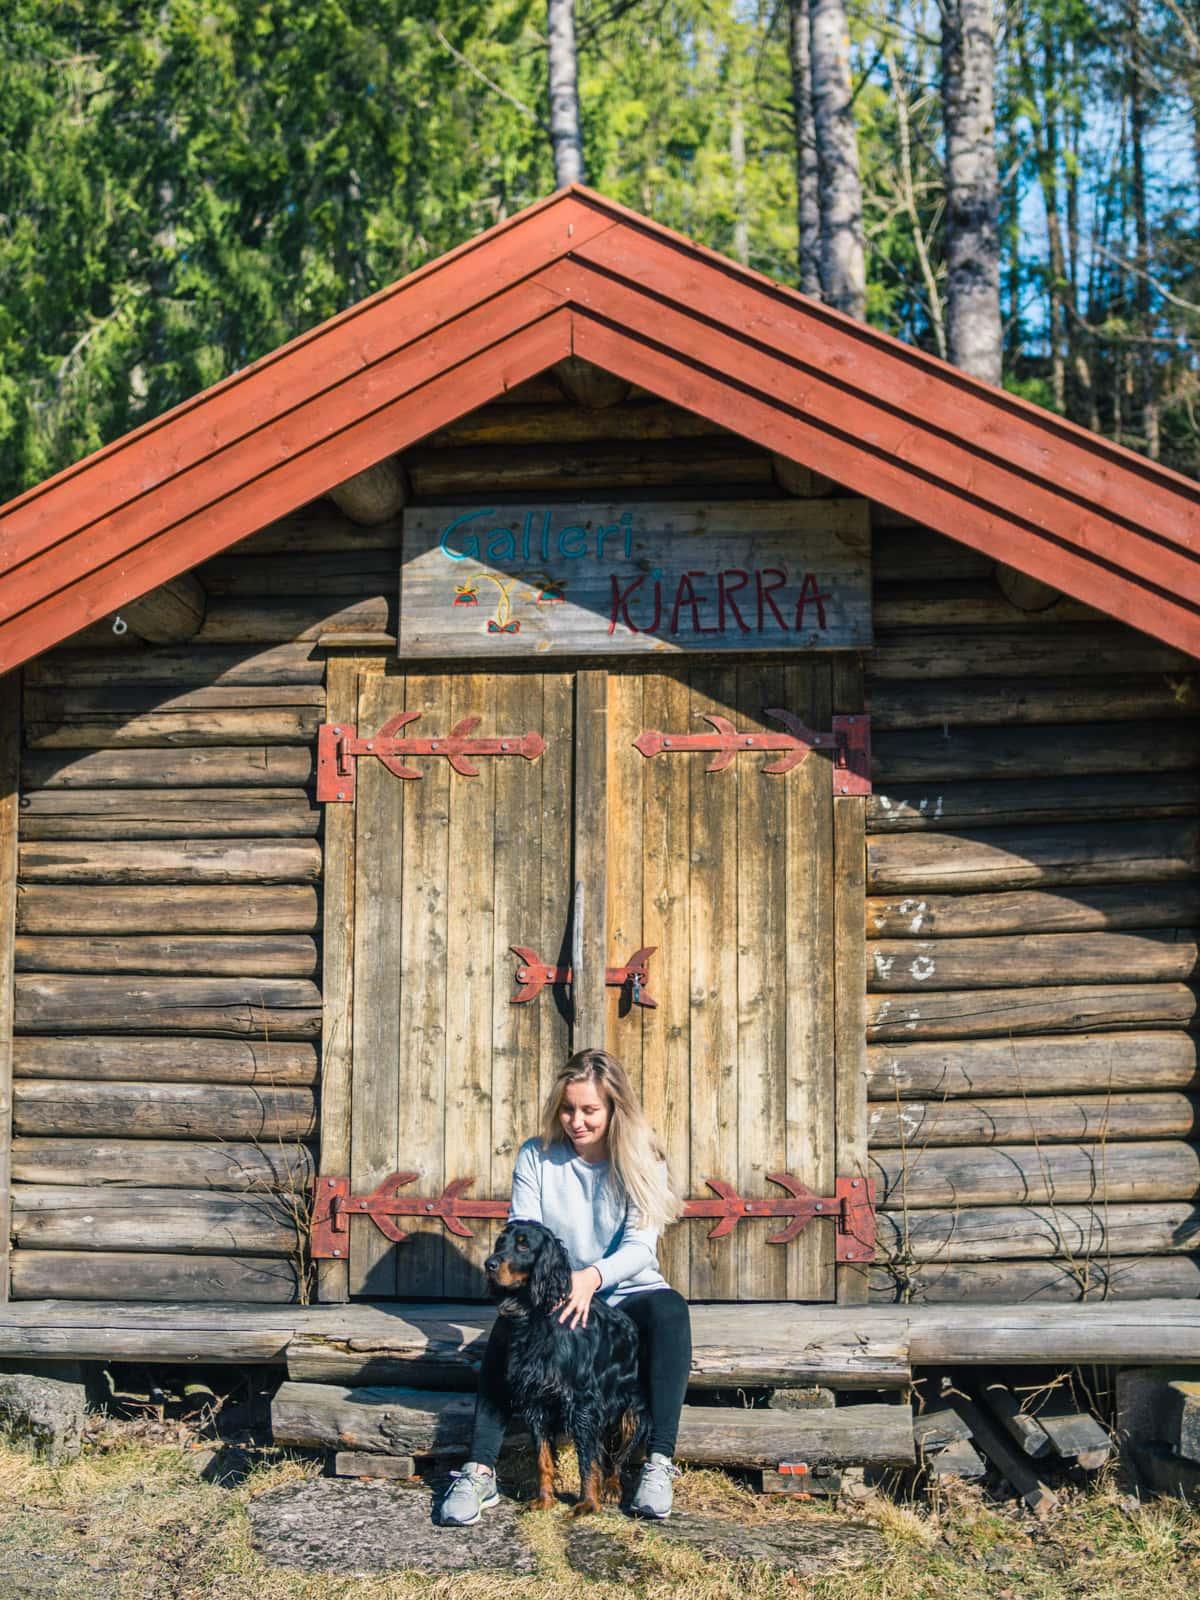 Kjærrafossen in Vestfold Norway - Favorite photos 2017 travel blogger